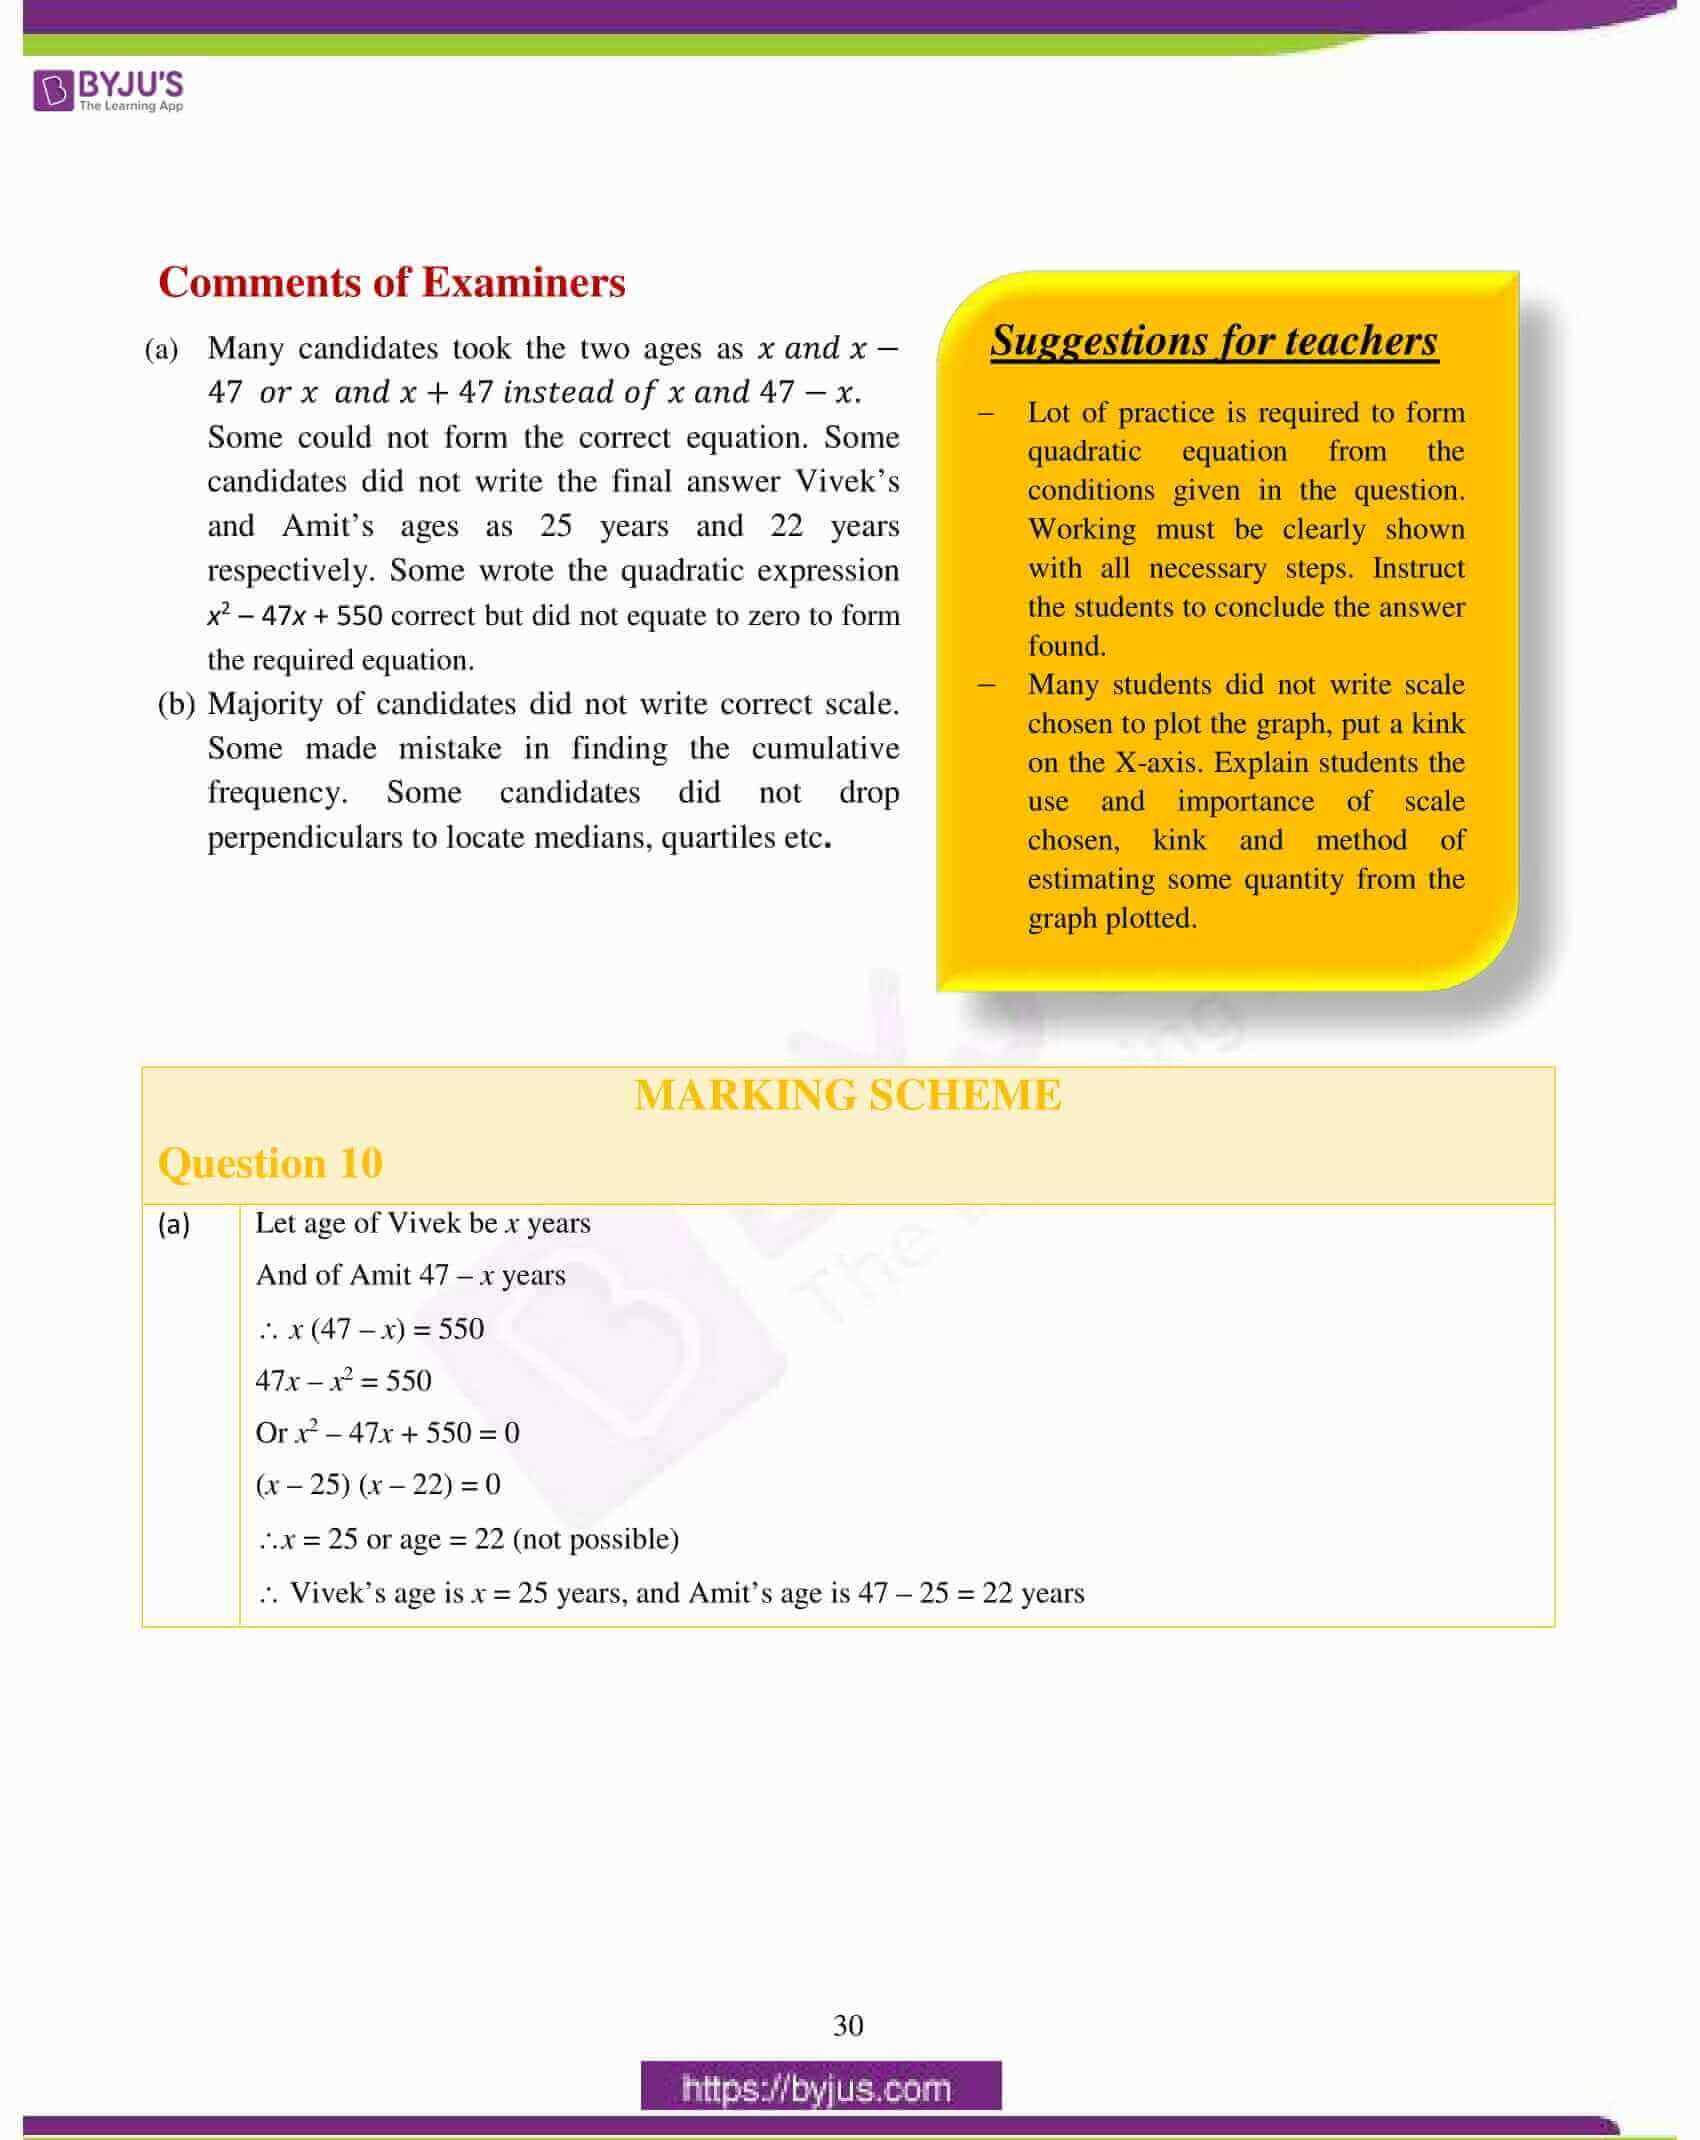 icse class 10 maths question paper solution 2017 21